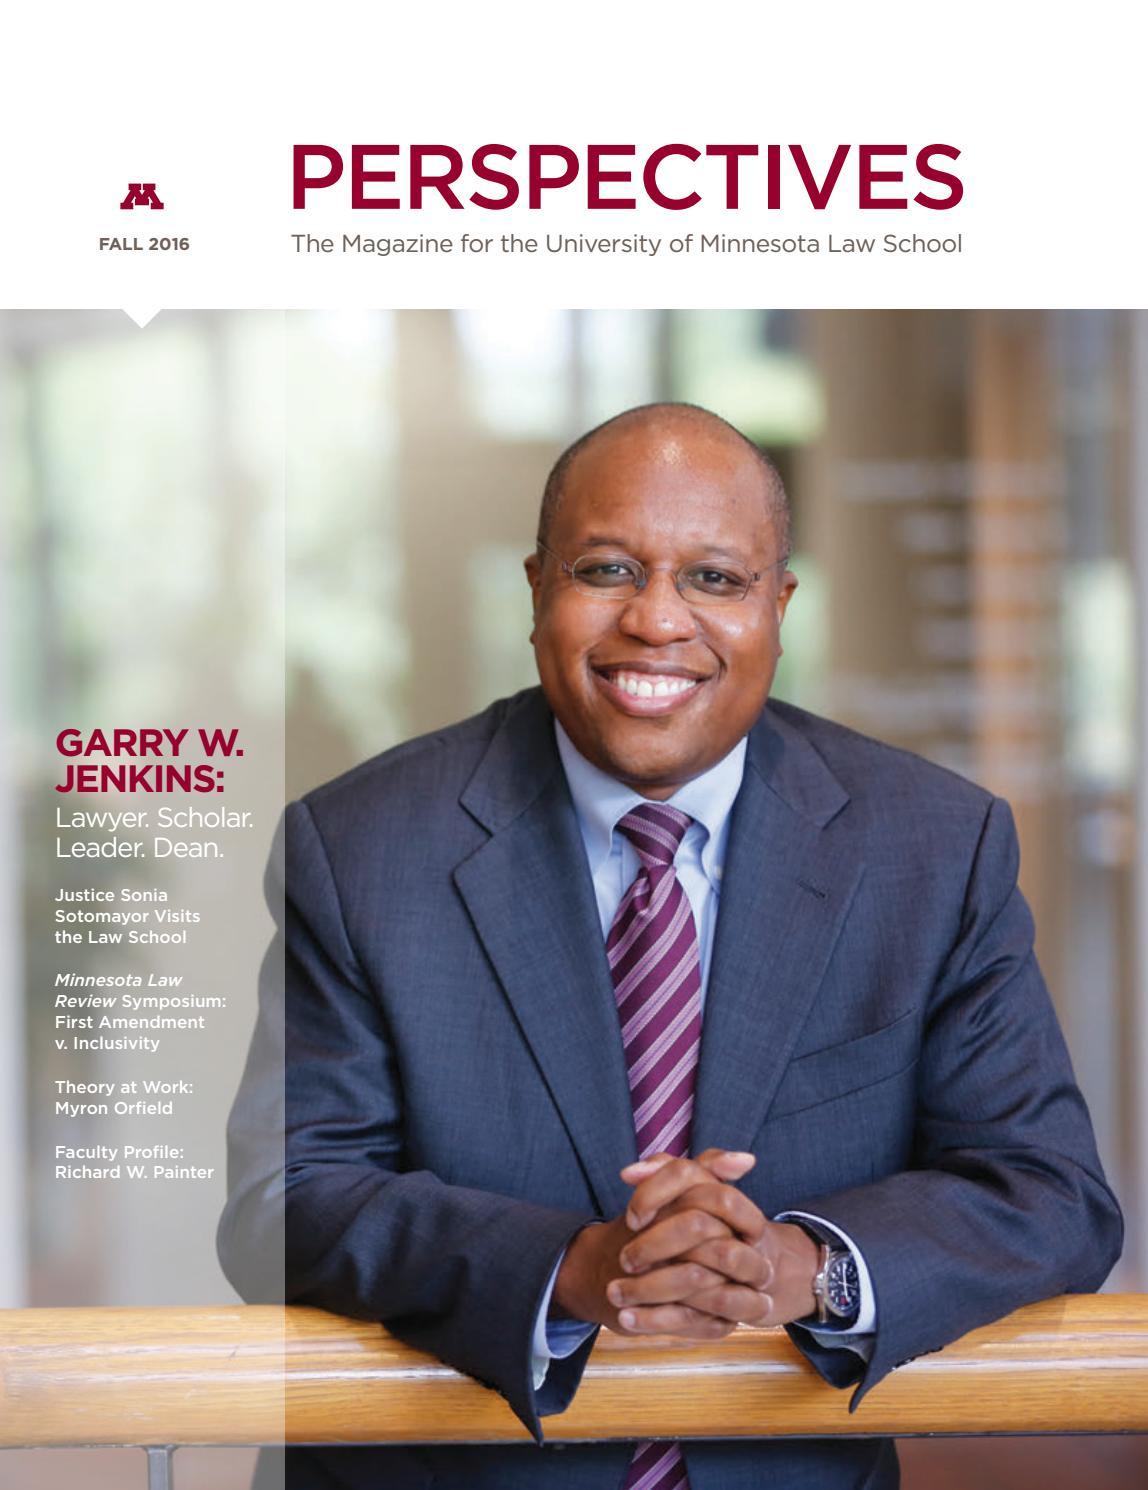 e1525f2f3b4 Fall 2016 Perspectives by University of Minnesota Law School - issuu